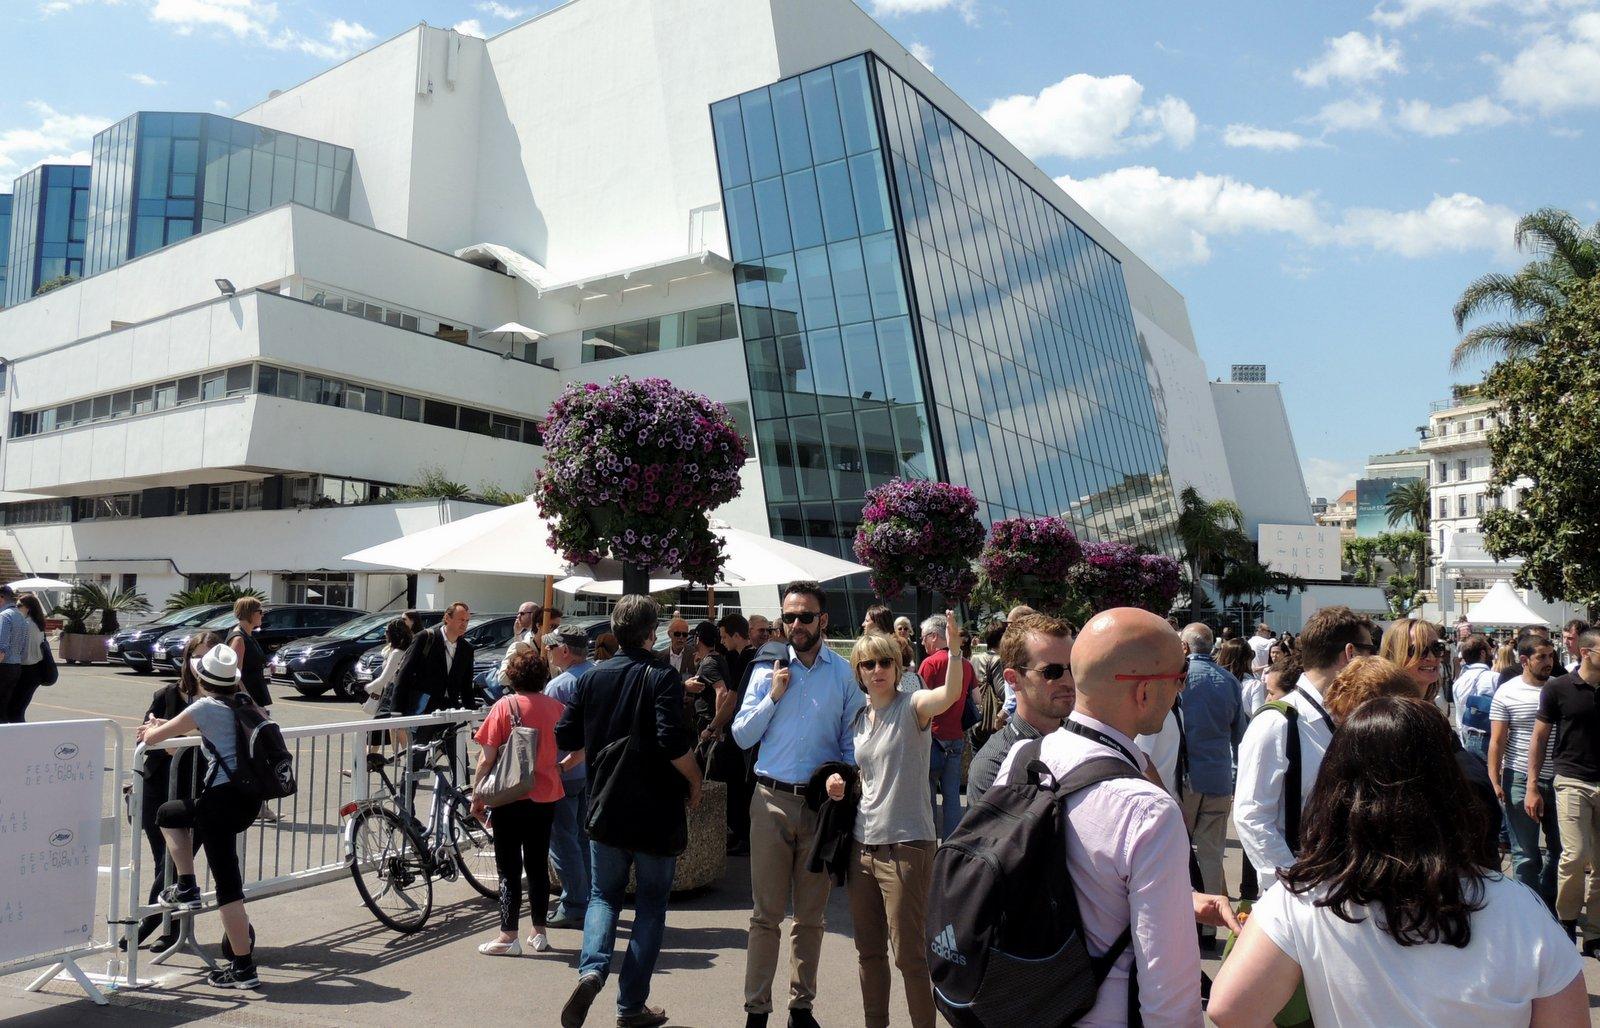 Filfestspiele in Cannes - Côte d`Azur